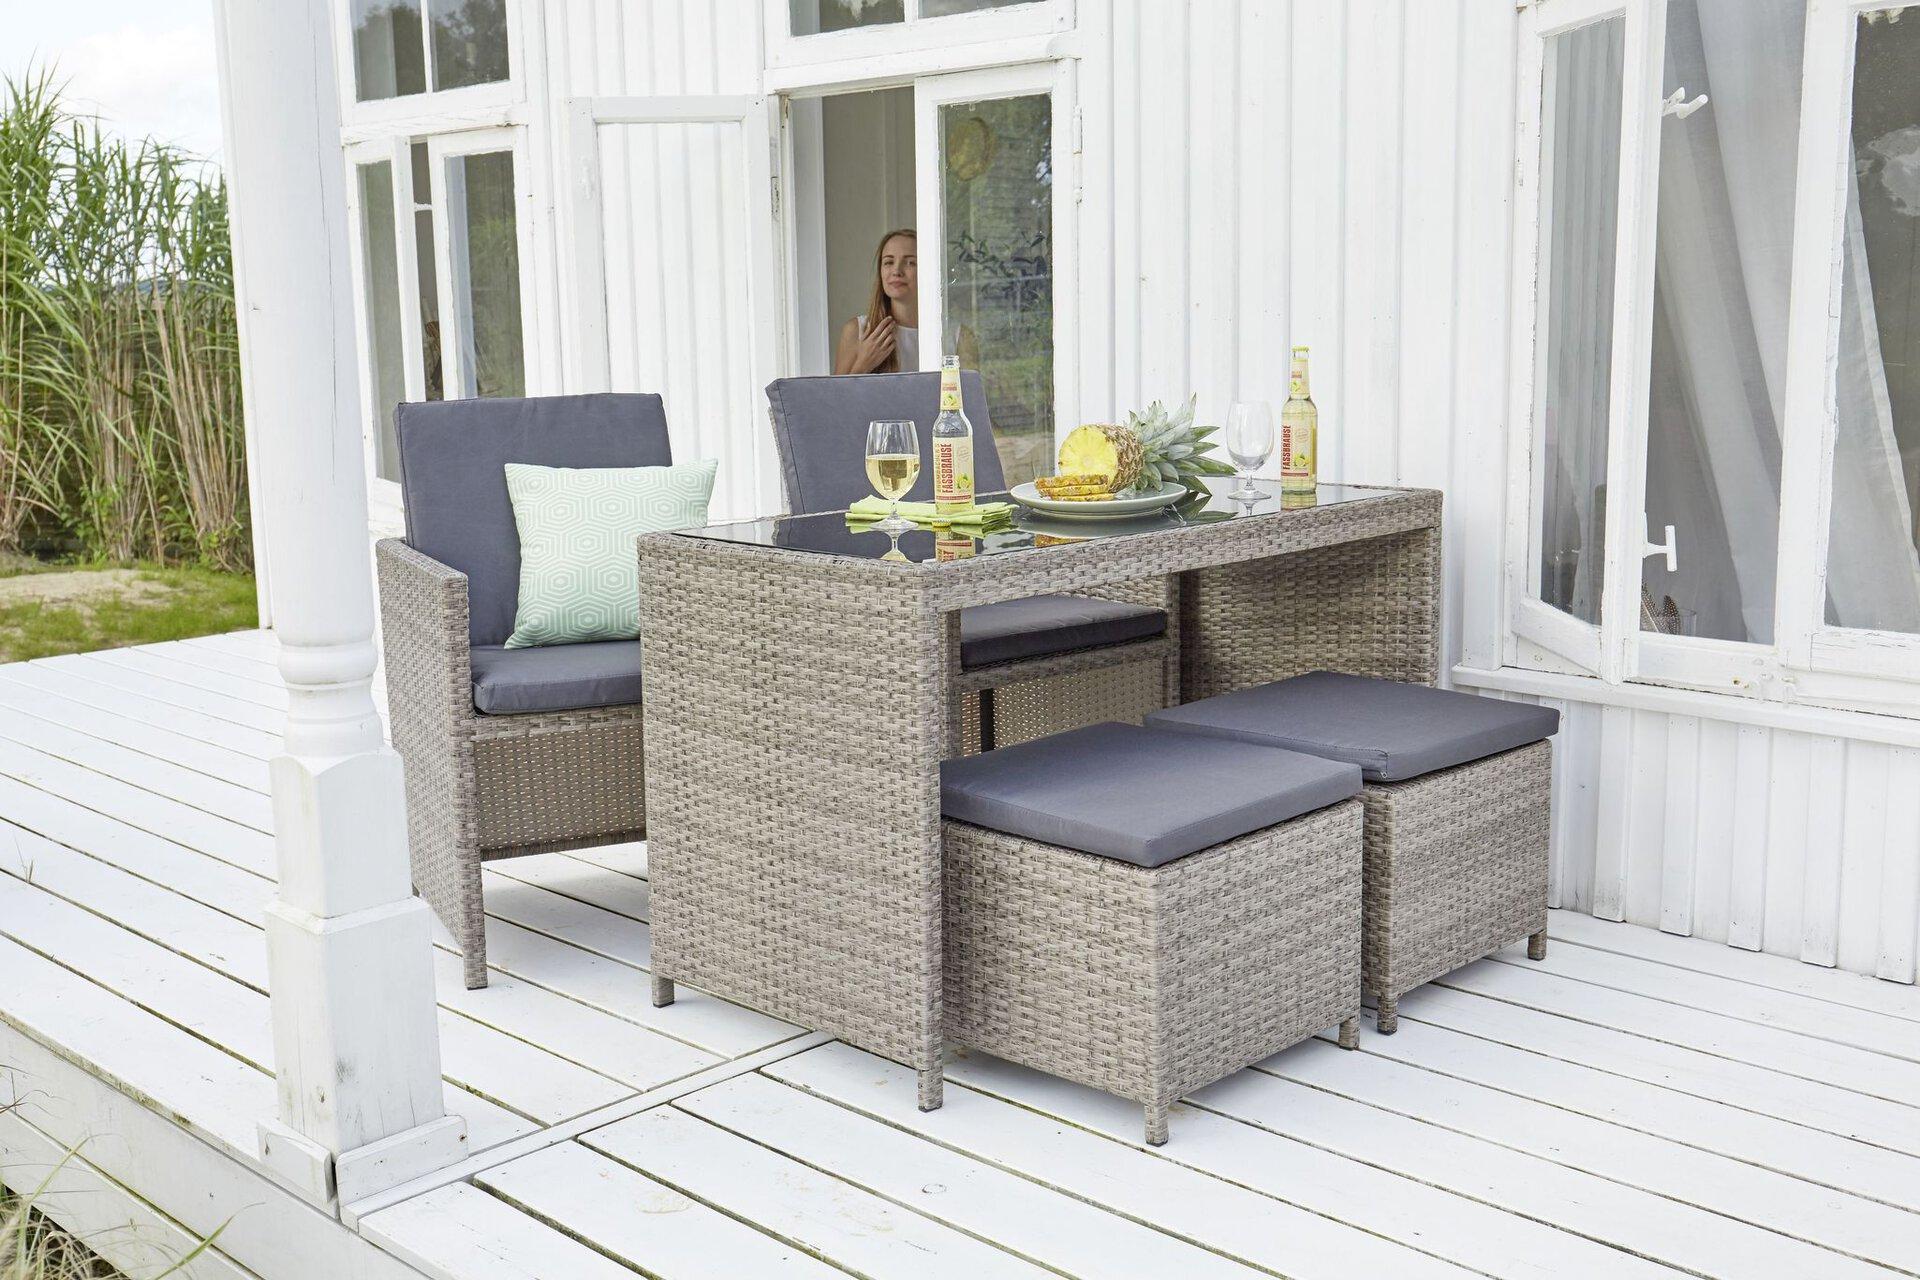 Balkon-Set BELA Outdoor Textil 60 x 72 x 120 cm